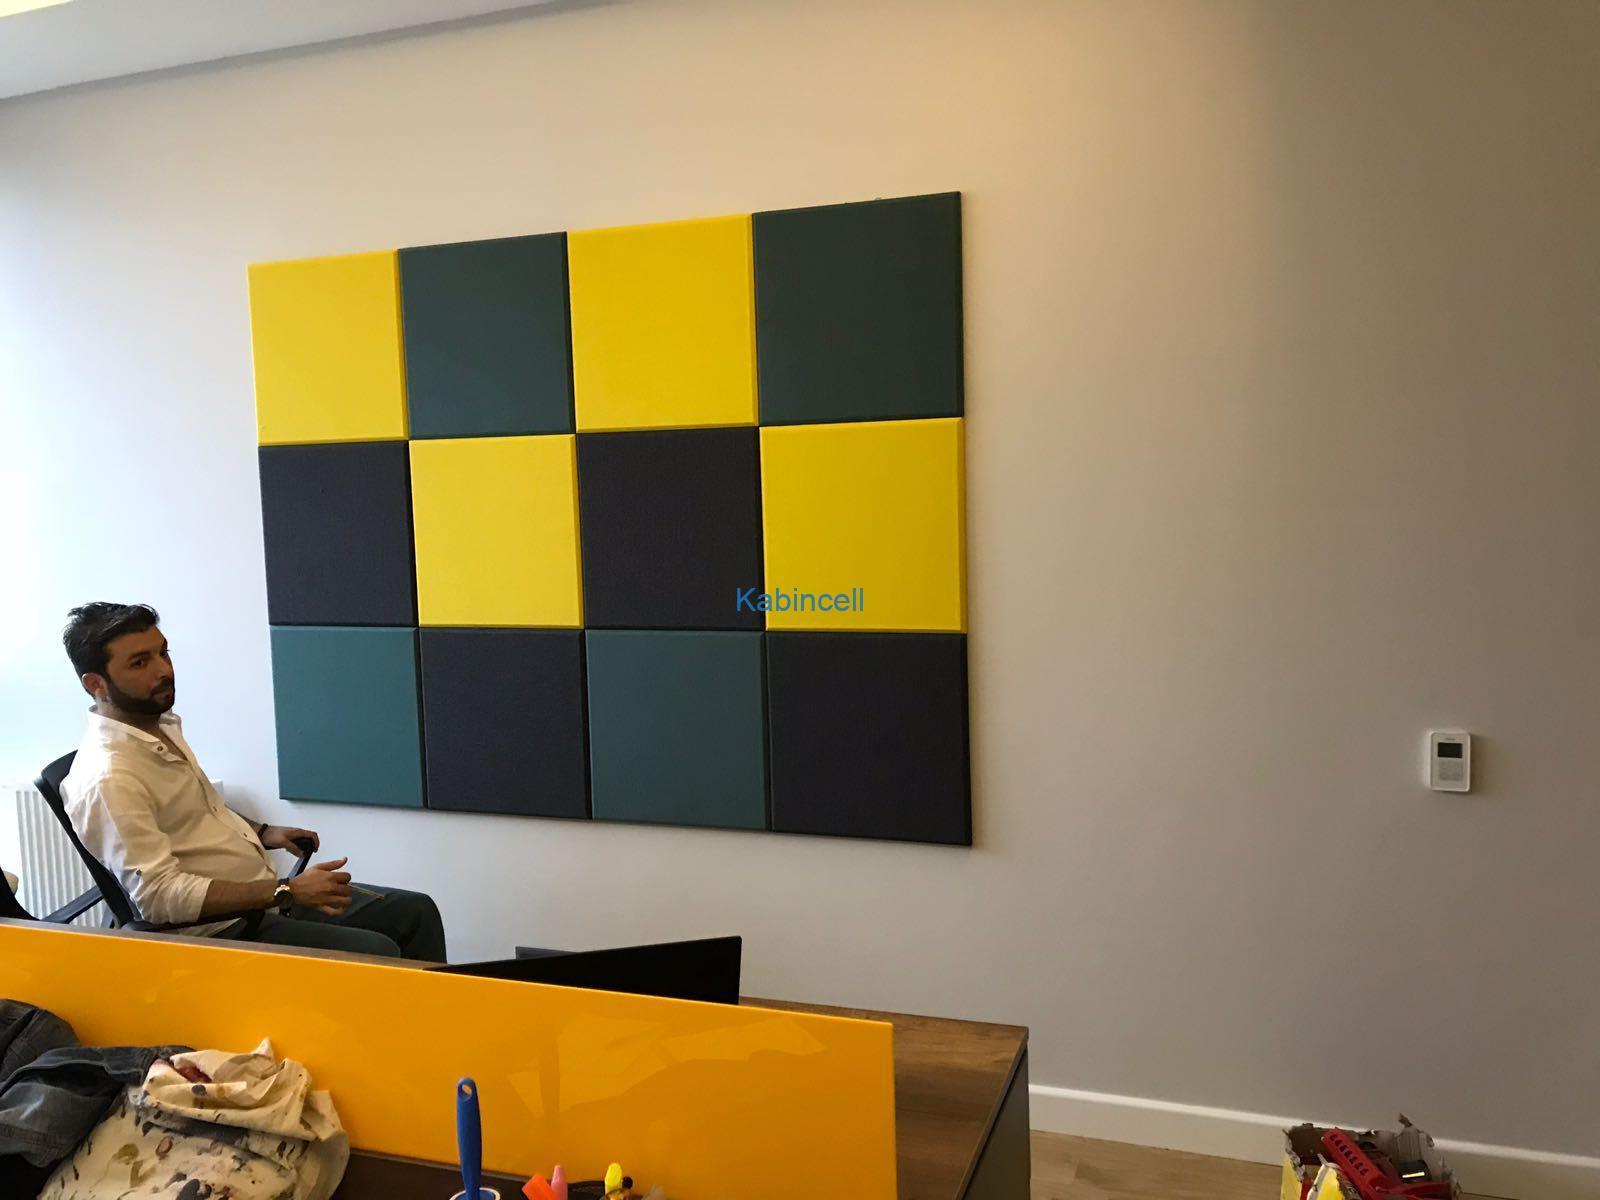 ofis-akustik-panel-kaplama-ses-ve-yanki-yalitimi4